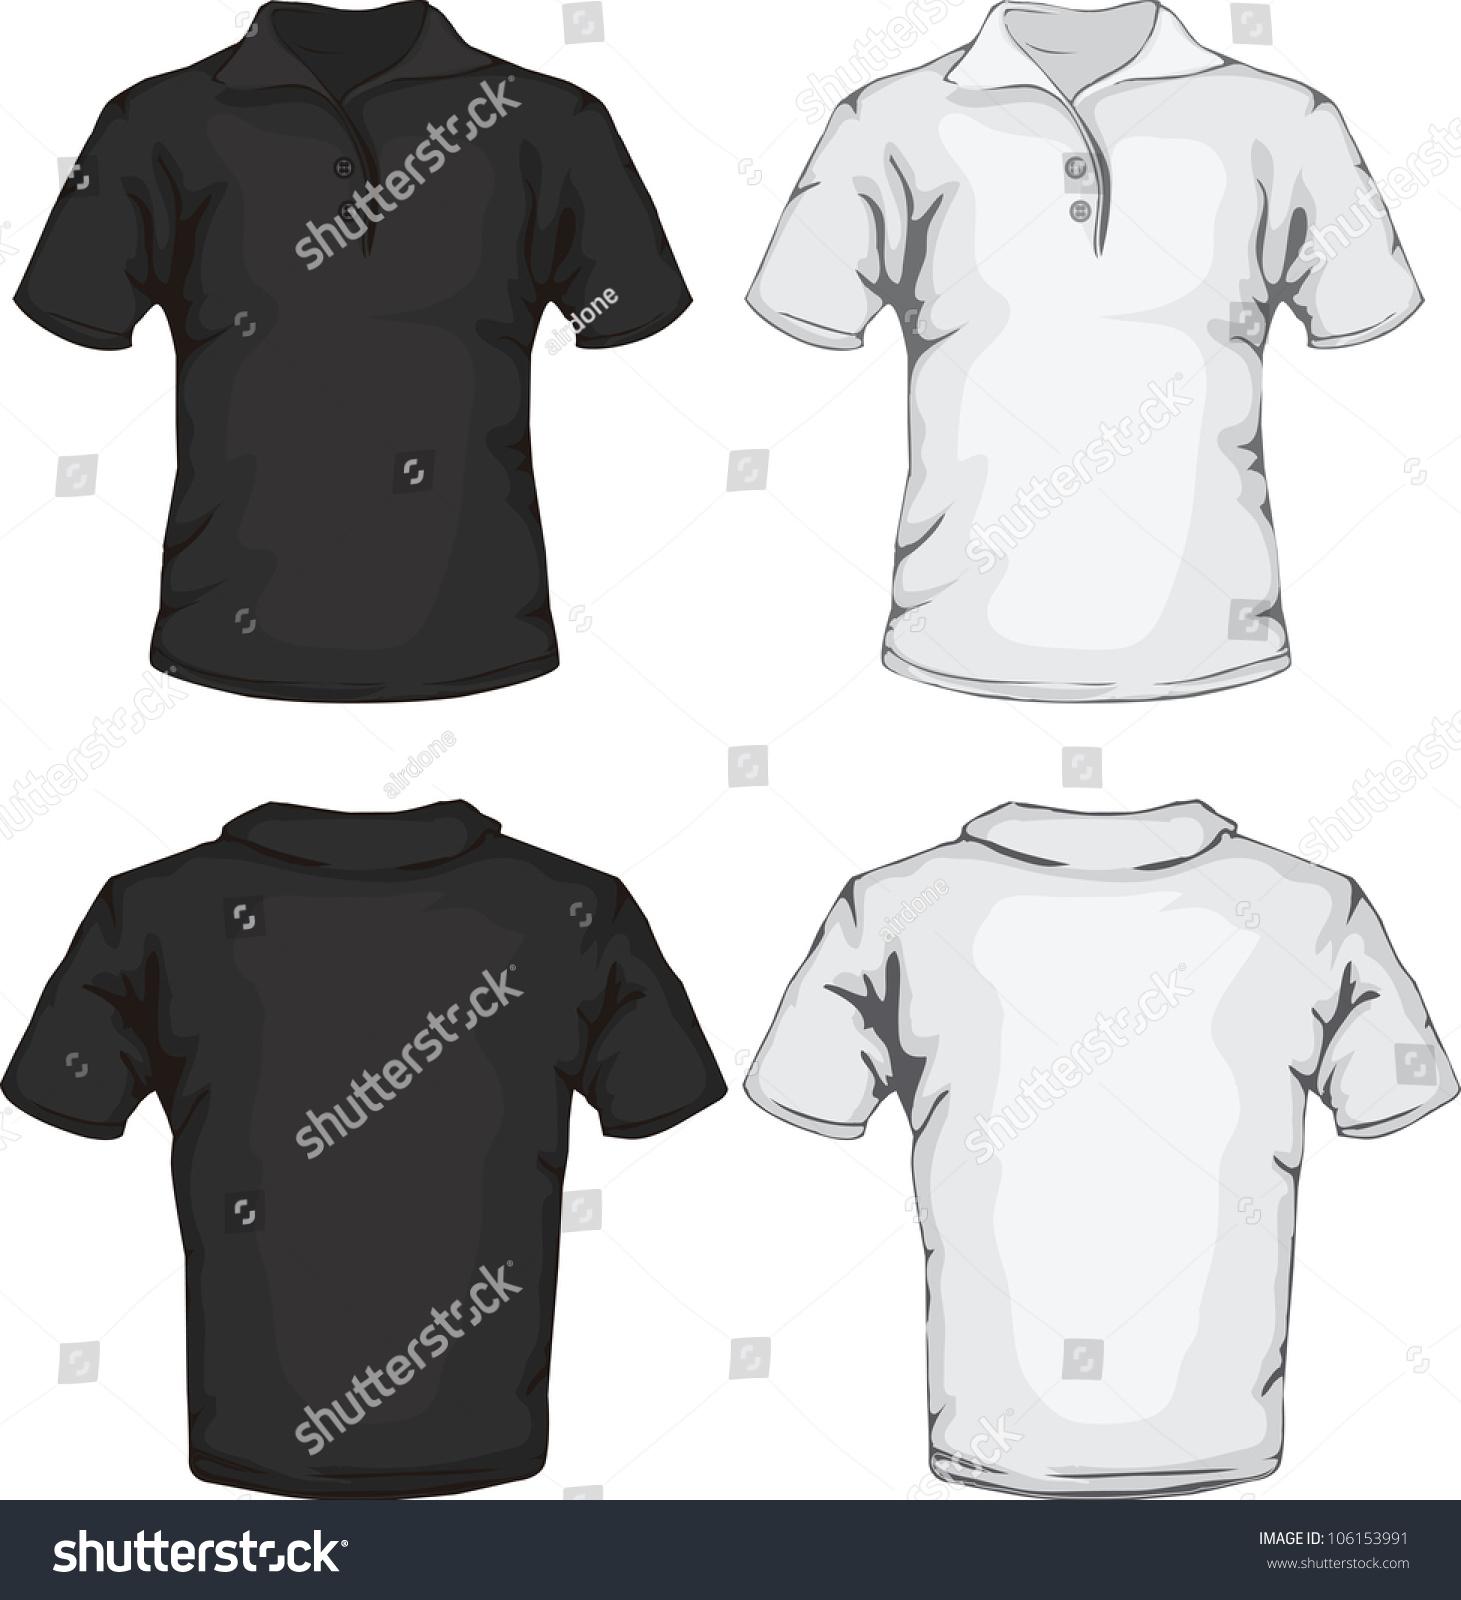 Vector Illustration Of Men'S Polo Shirt Template In Black